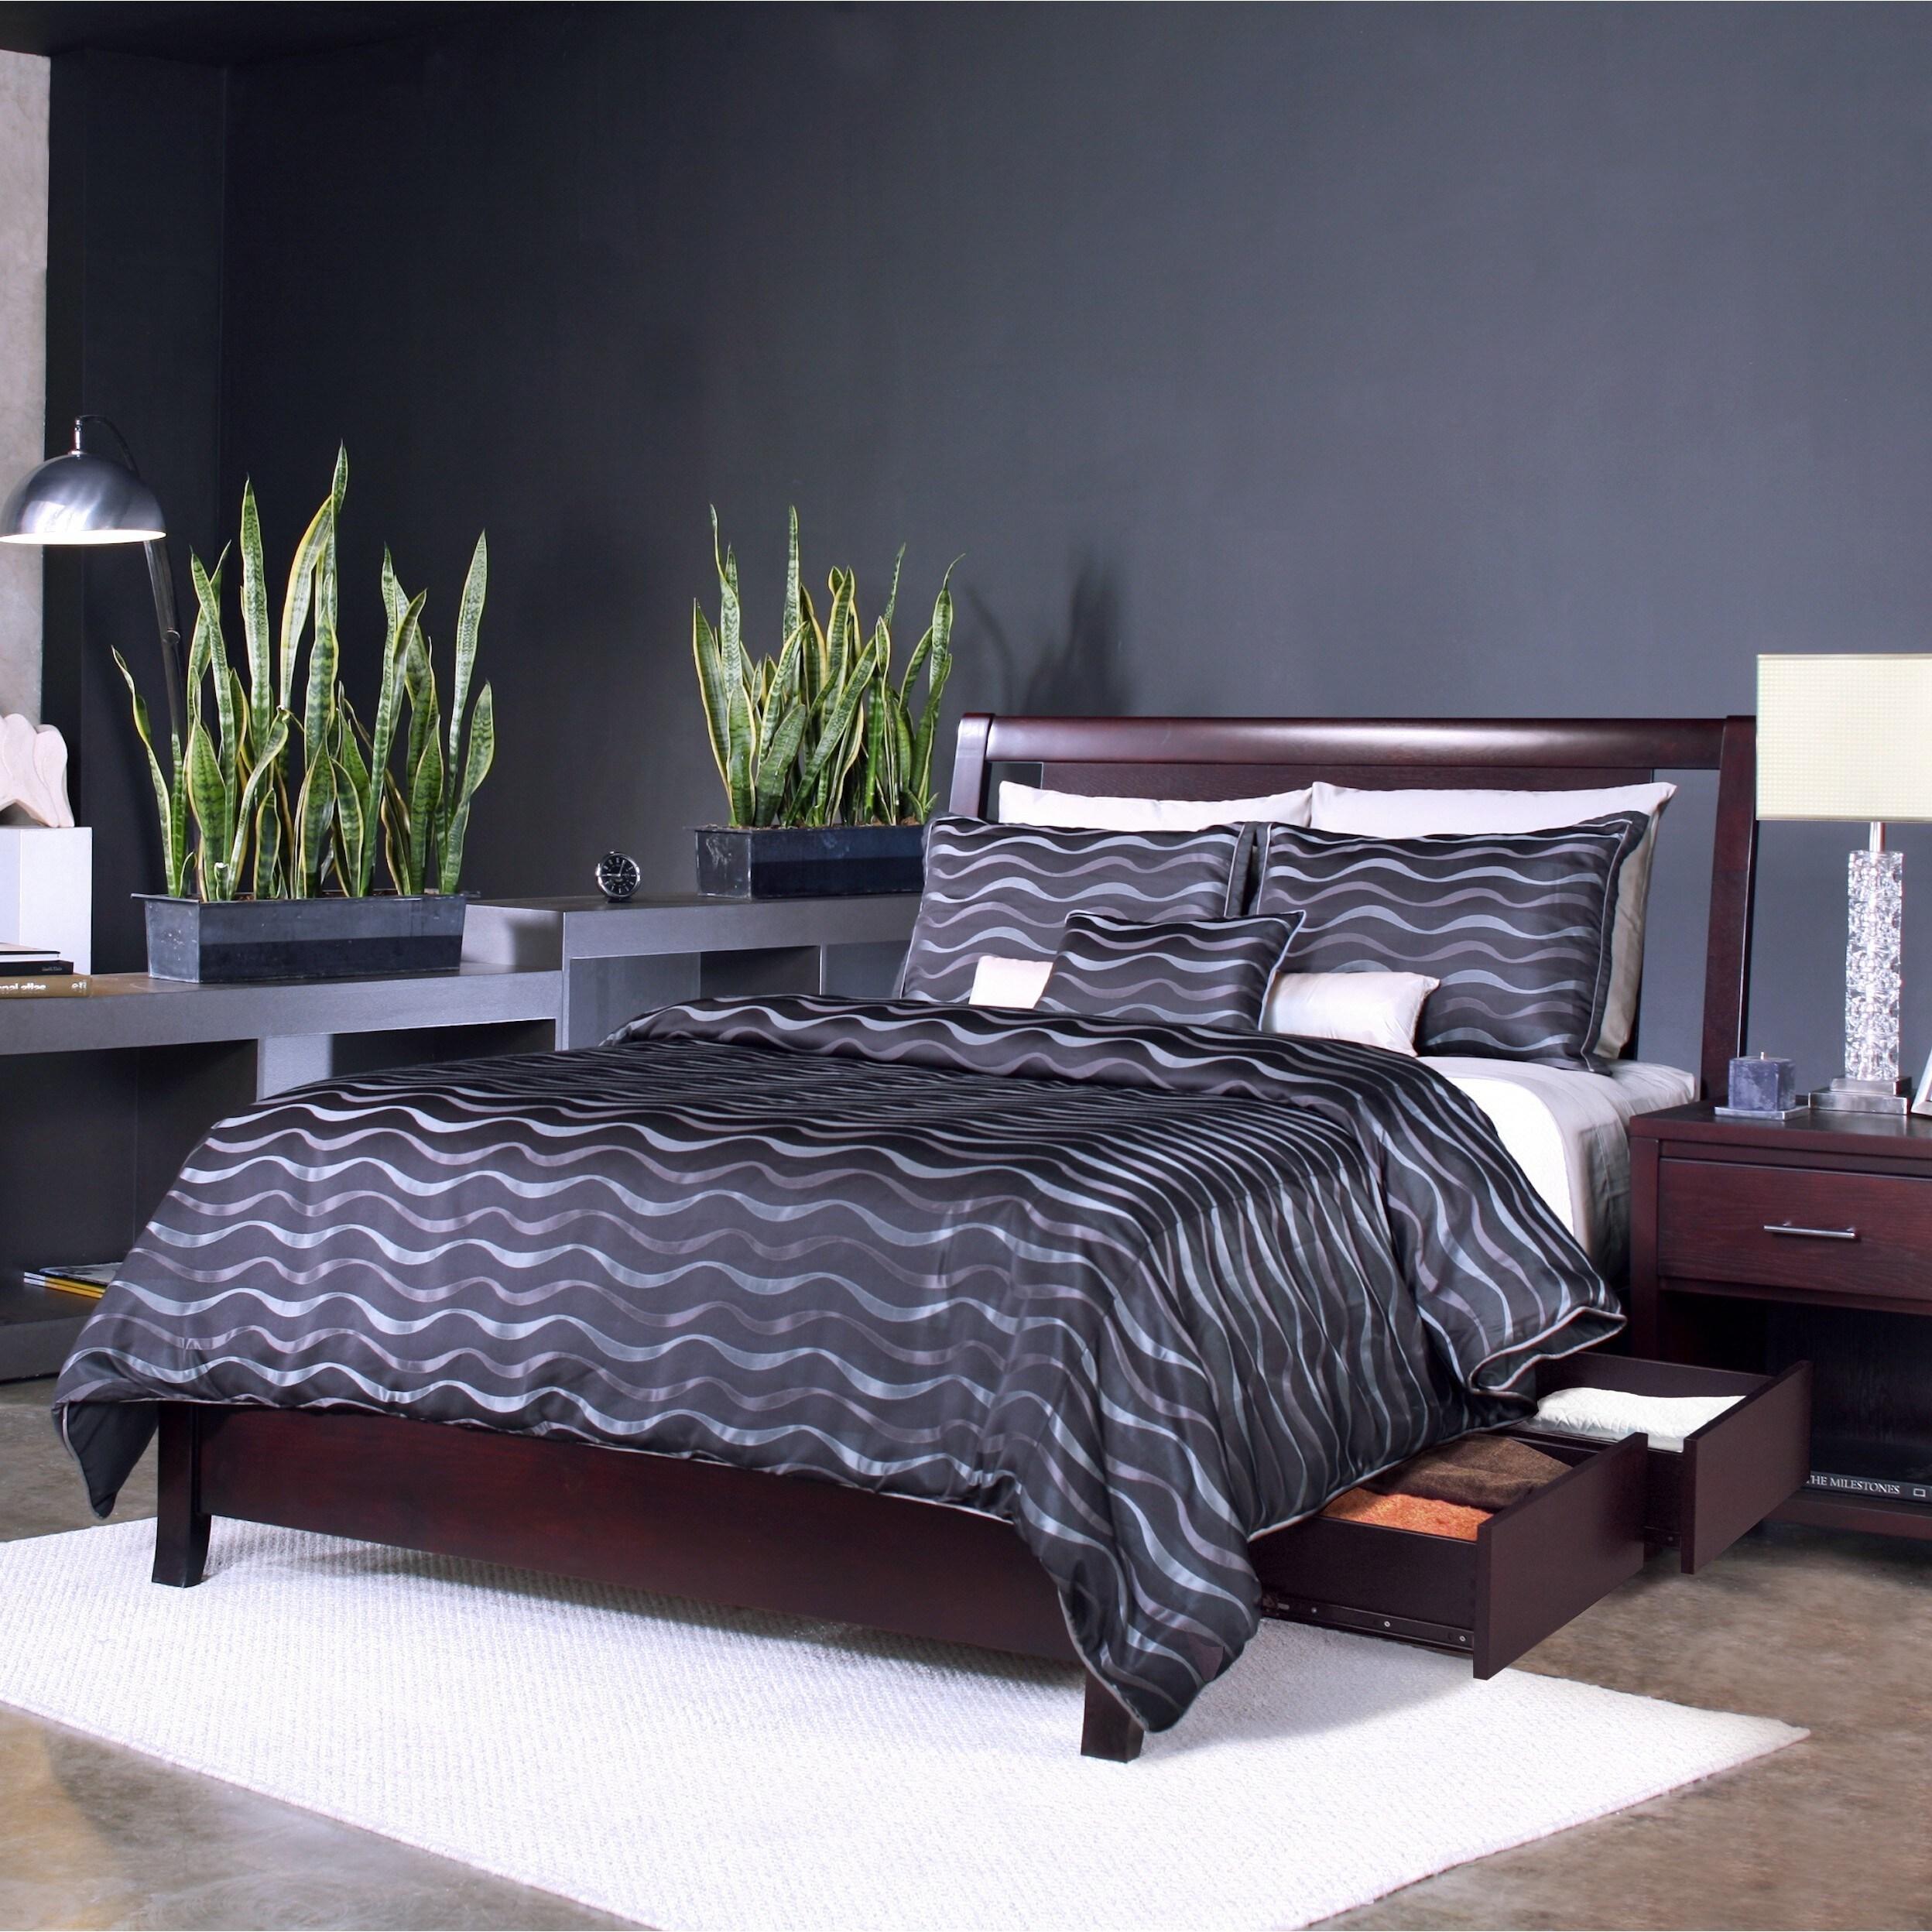 Espresso Floating Panel Low Profile Storage Bed